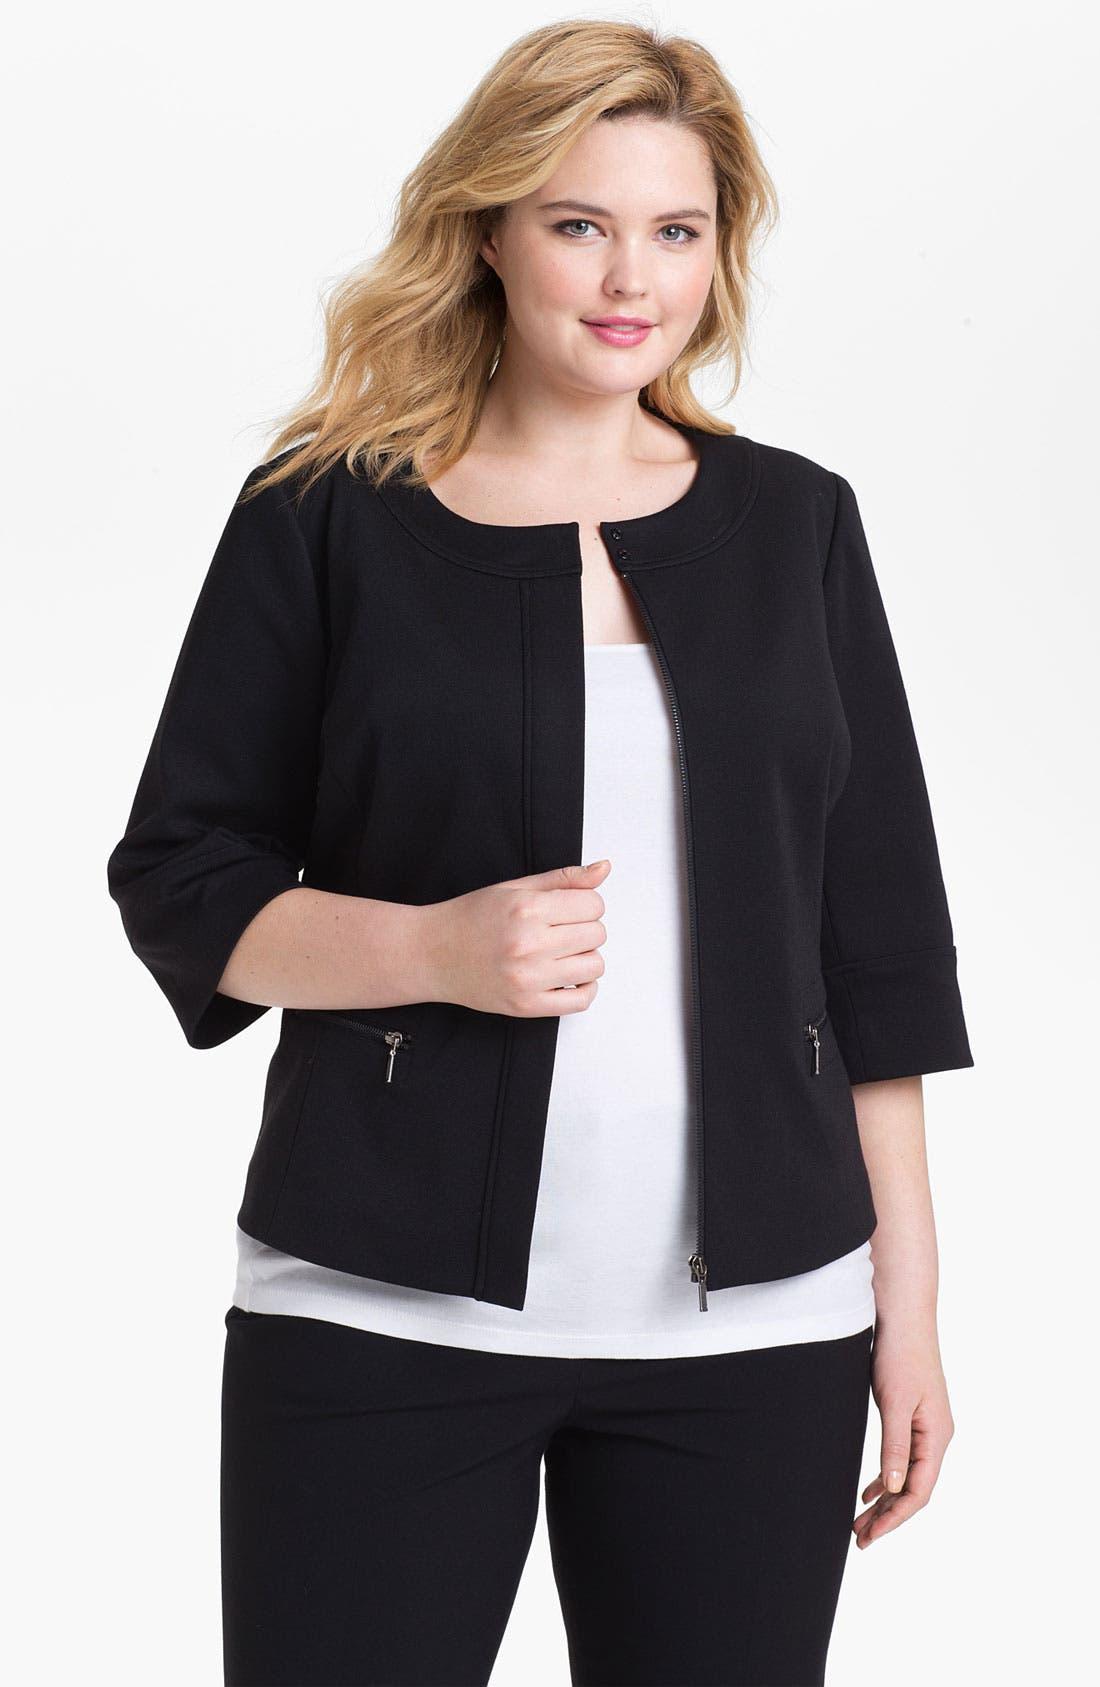 Alternate Image 1 Selected - Sejour Zip Front Ponte Knit Jacket (Plus Size)